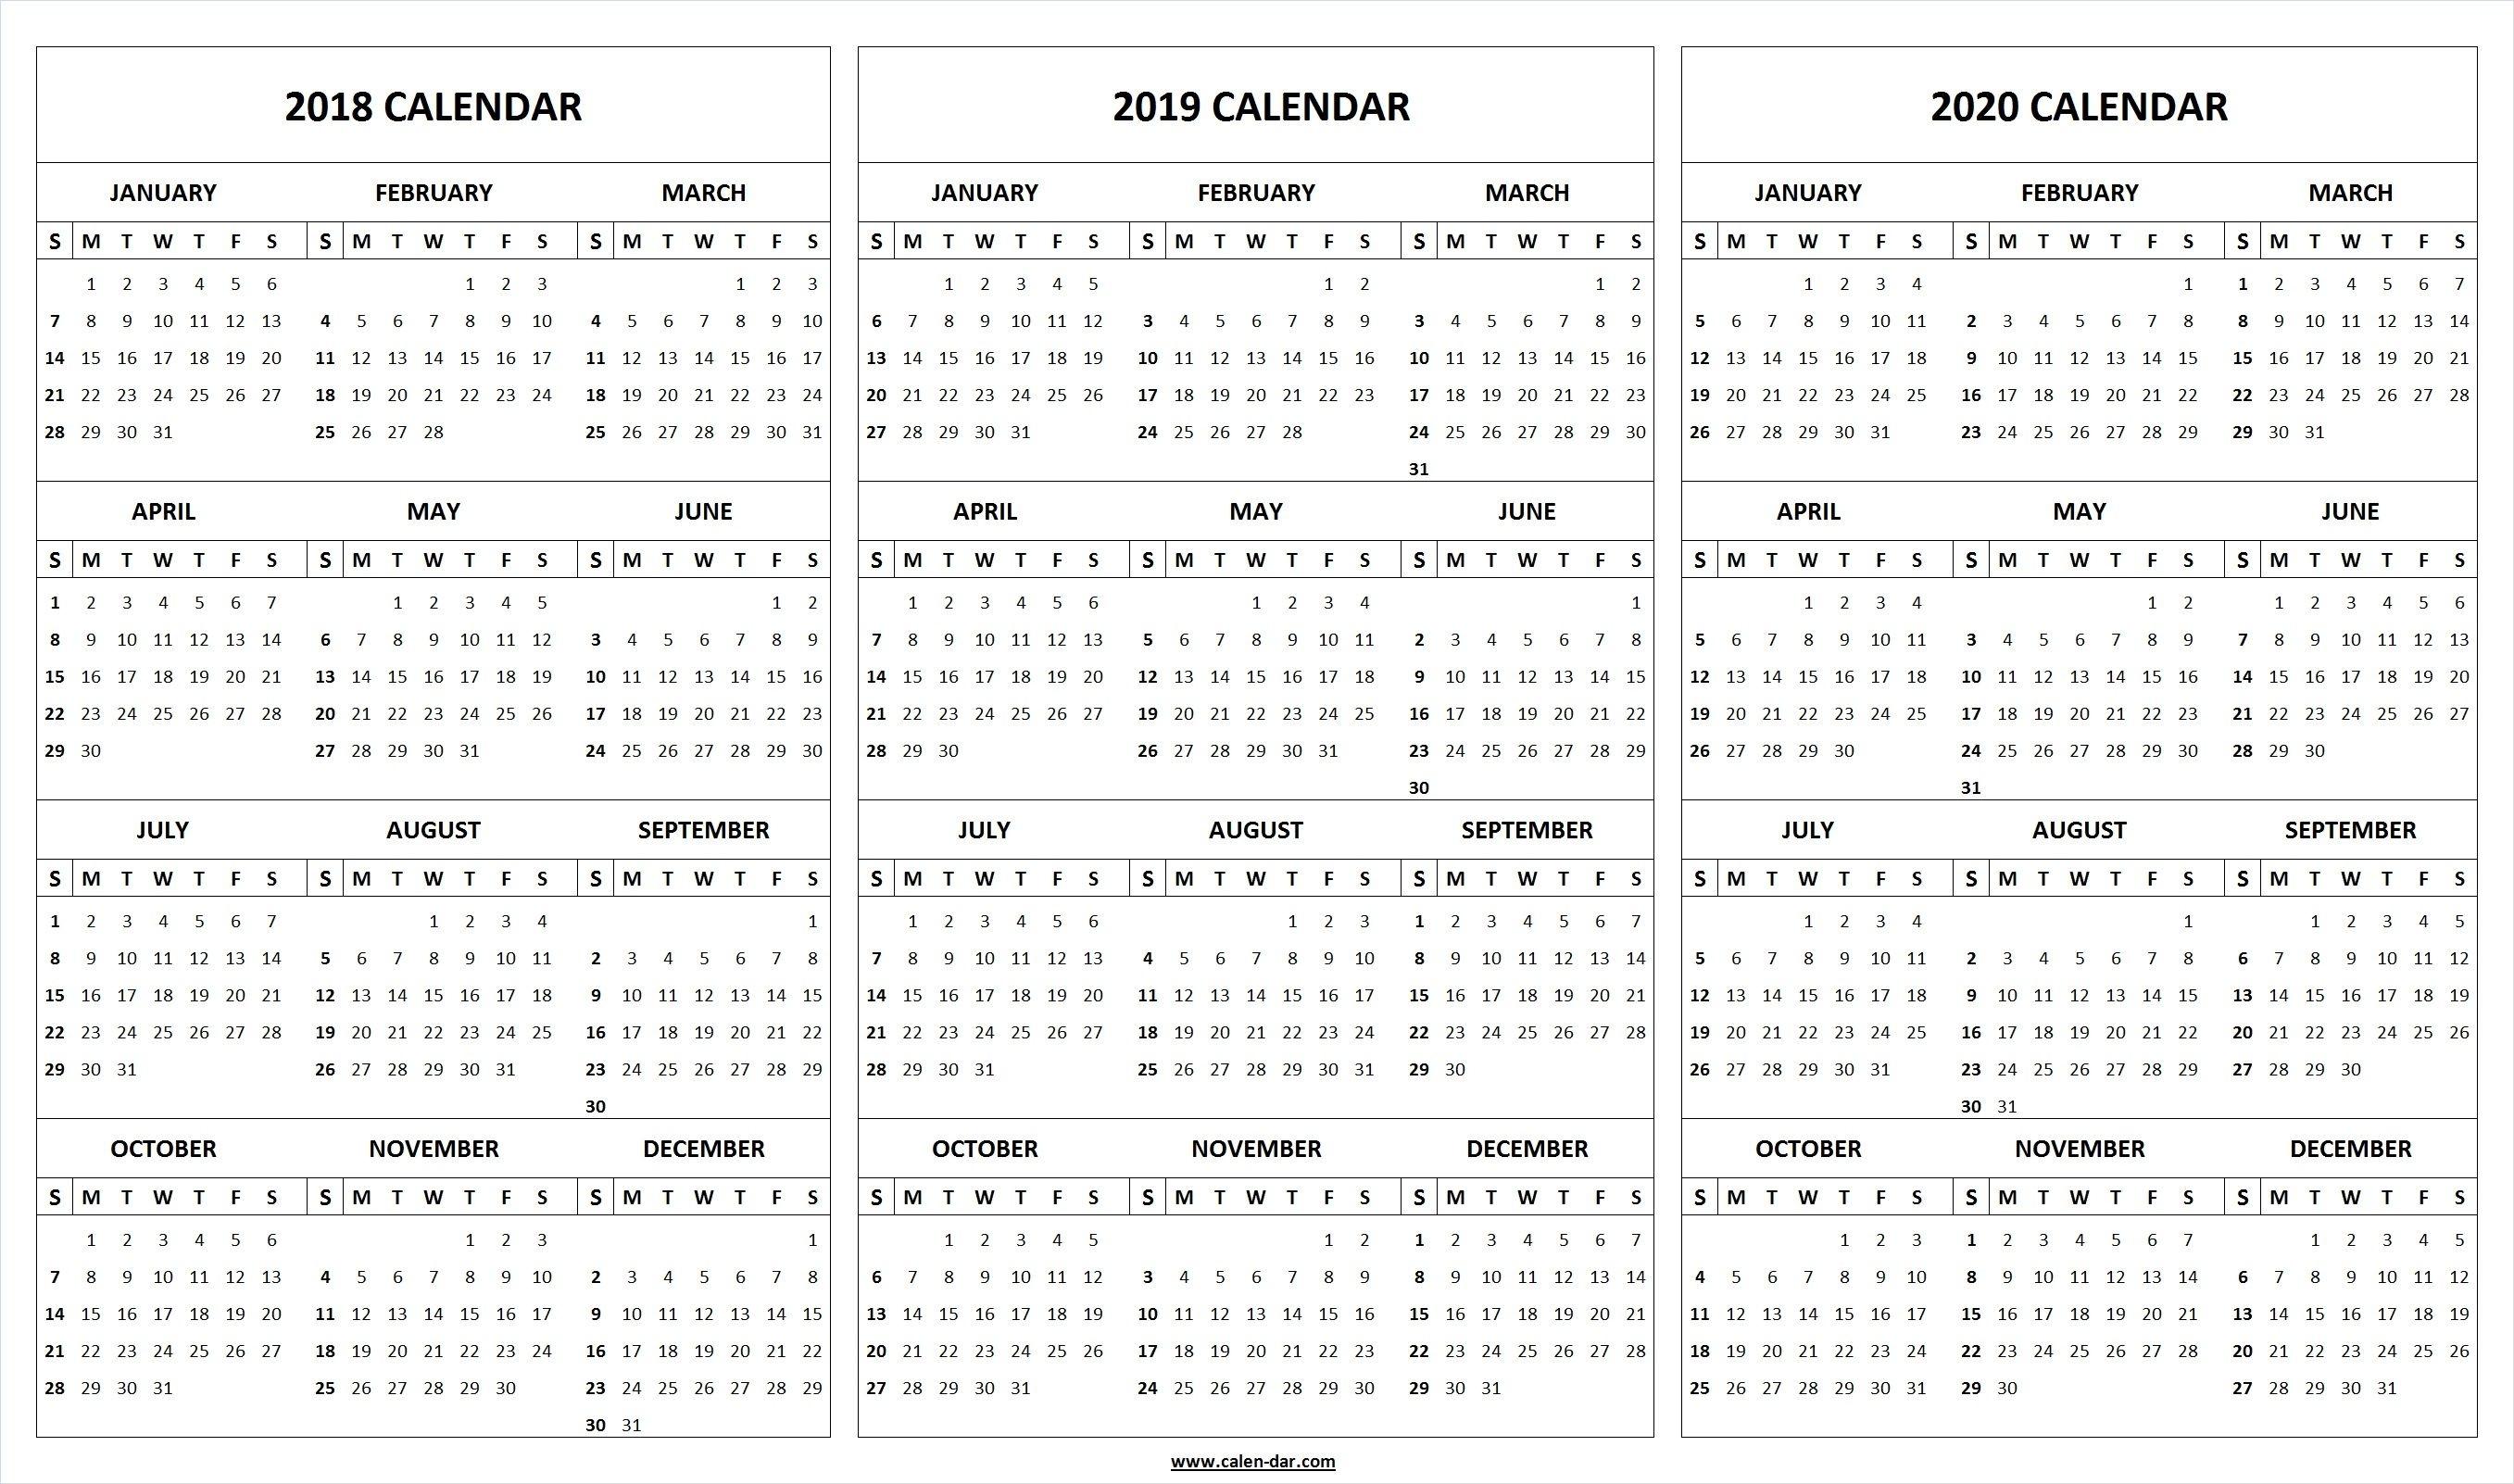 Print Blank 2018 2019 2020 Calendar Template | Organize! | Printable with regard to Half Page Calendars 2020 Printable